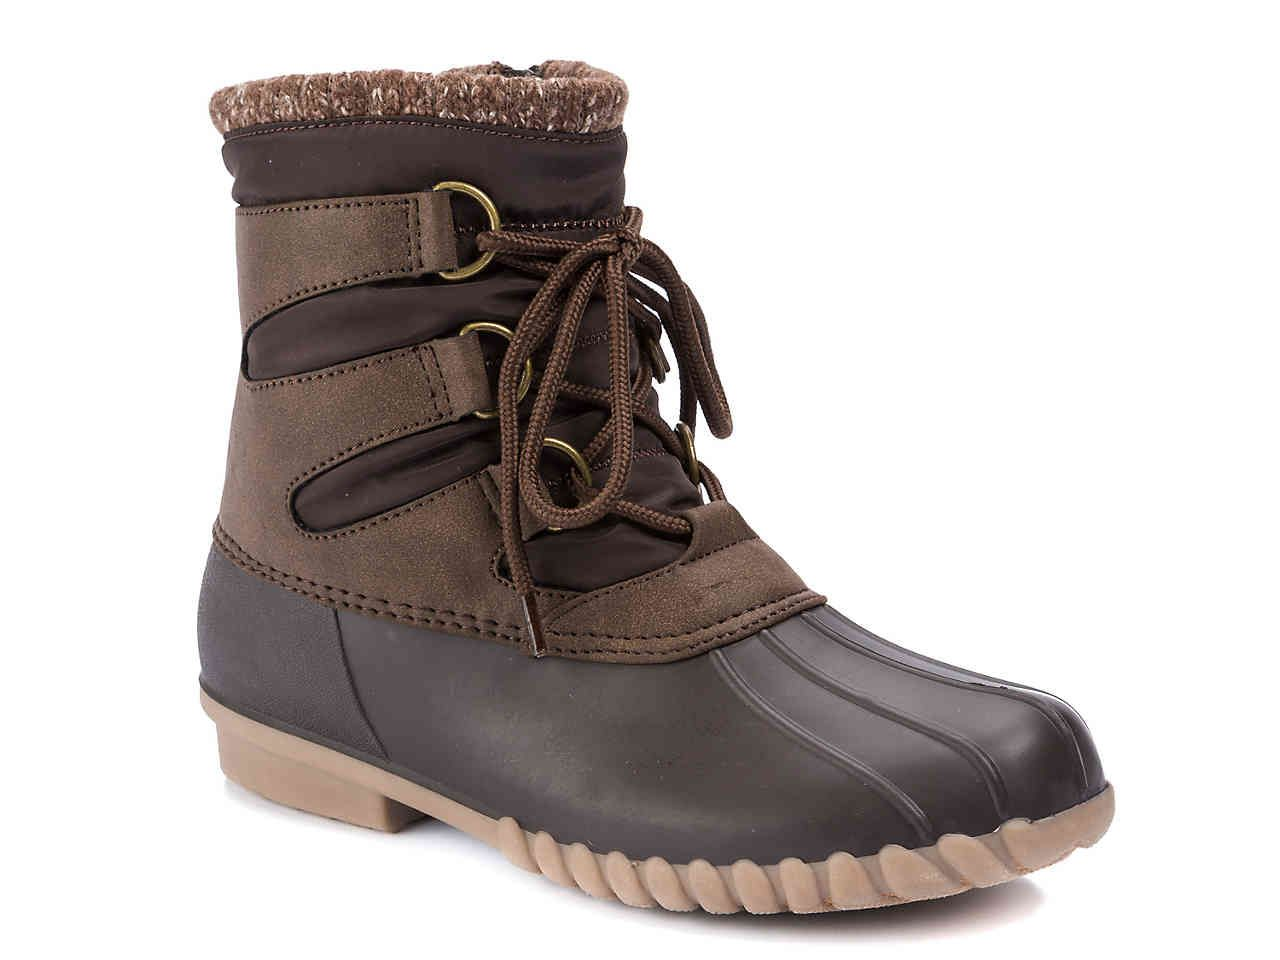 Bare Traps Fianna Duck Boot   Boots